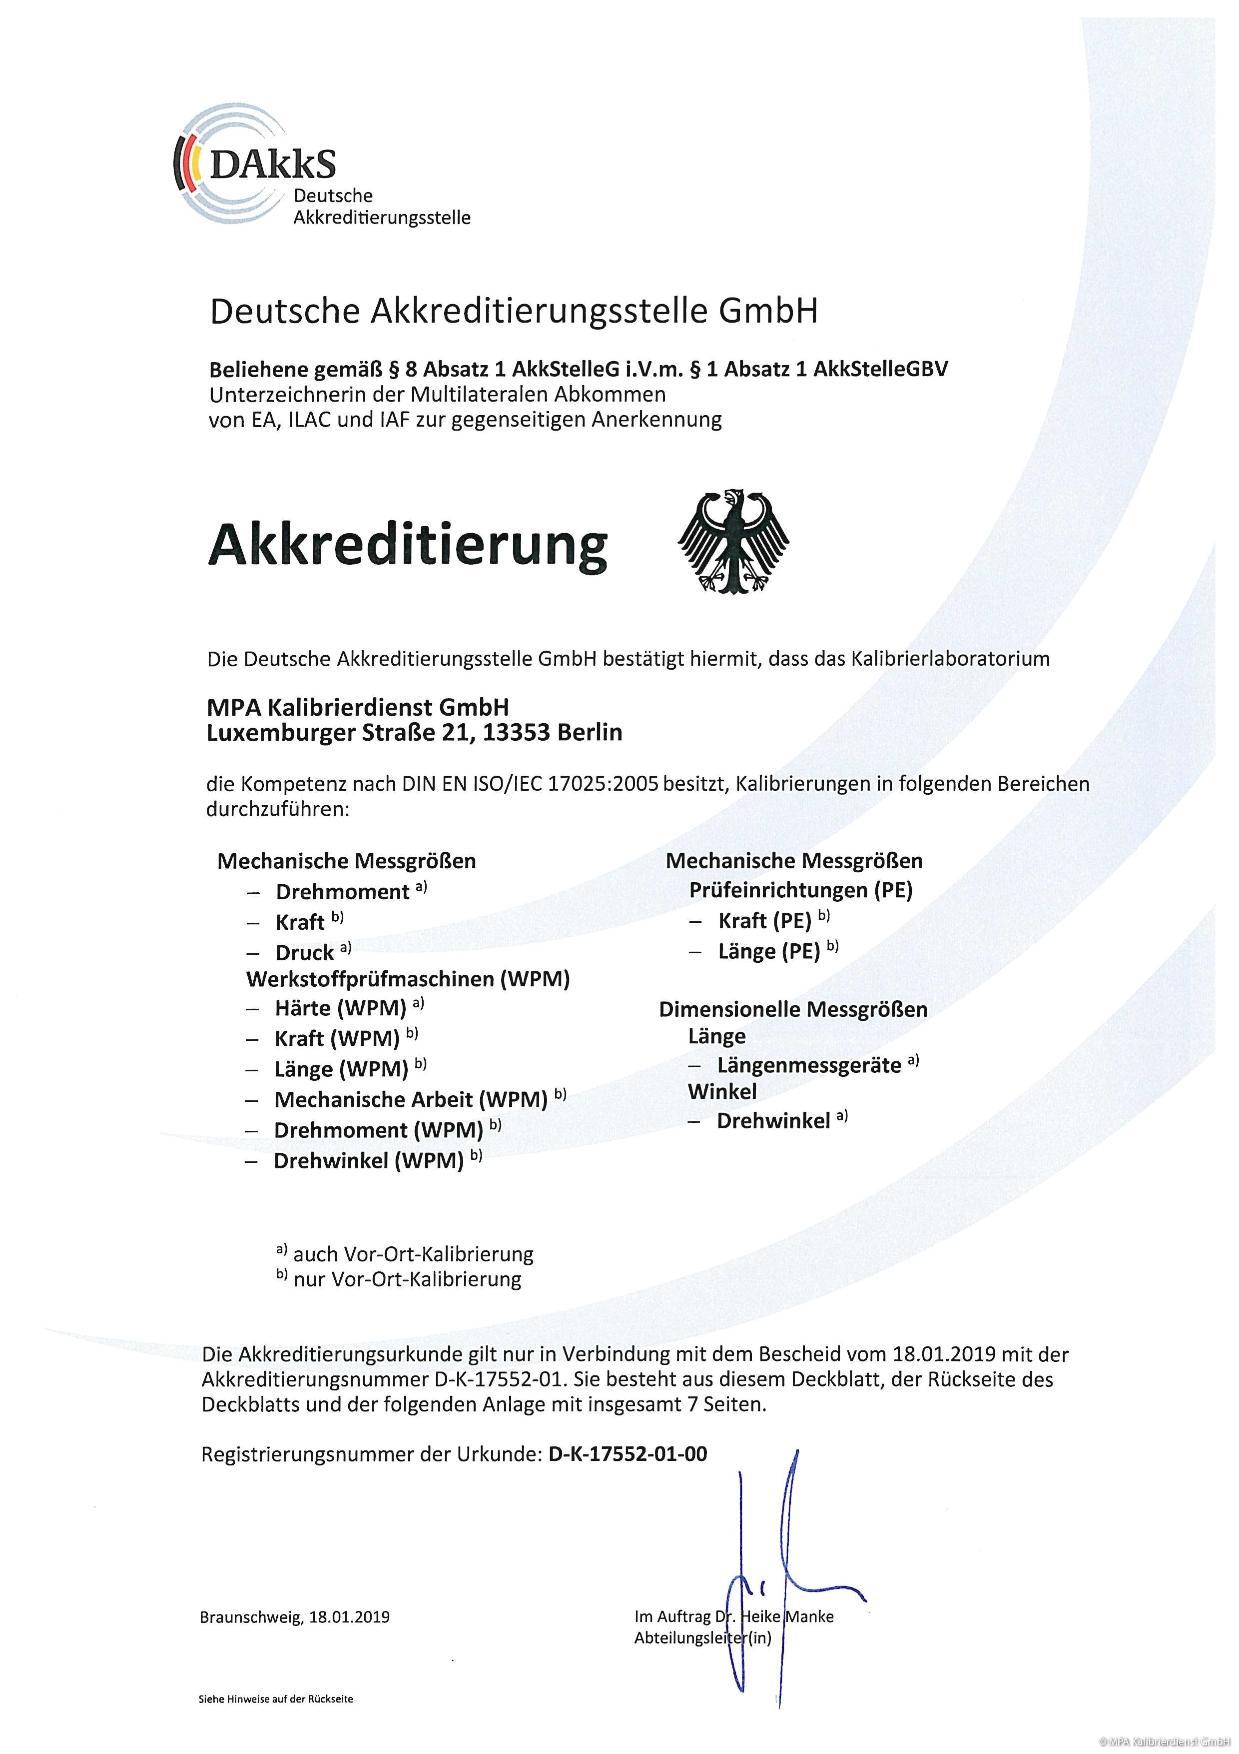 Akkreditierung - Deutsche Akkreditierungsstelle GmbH